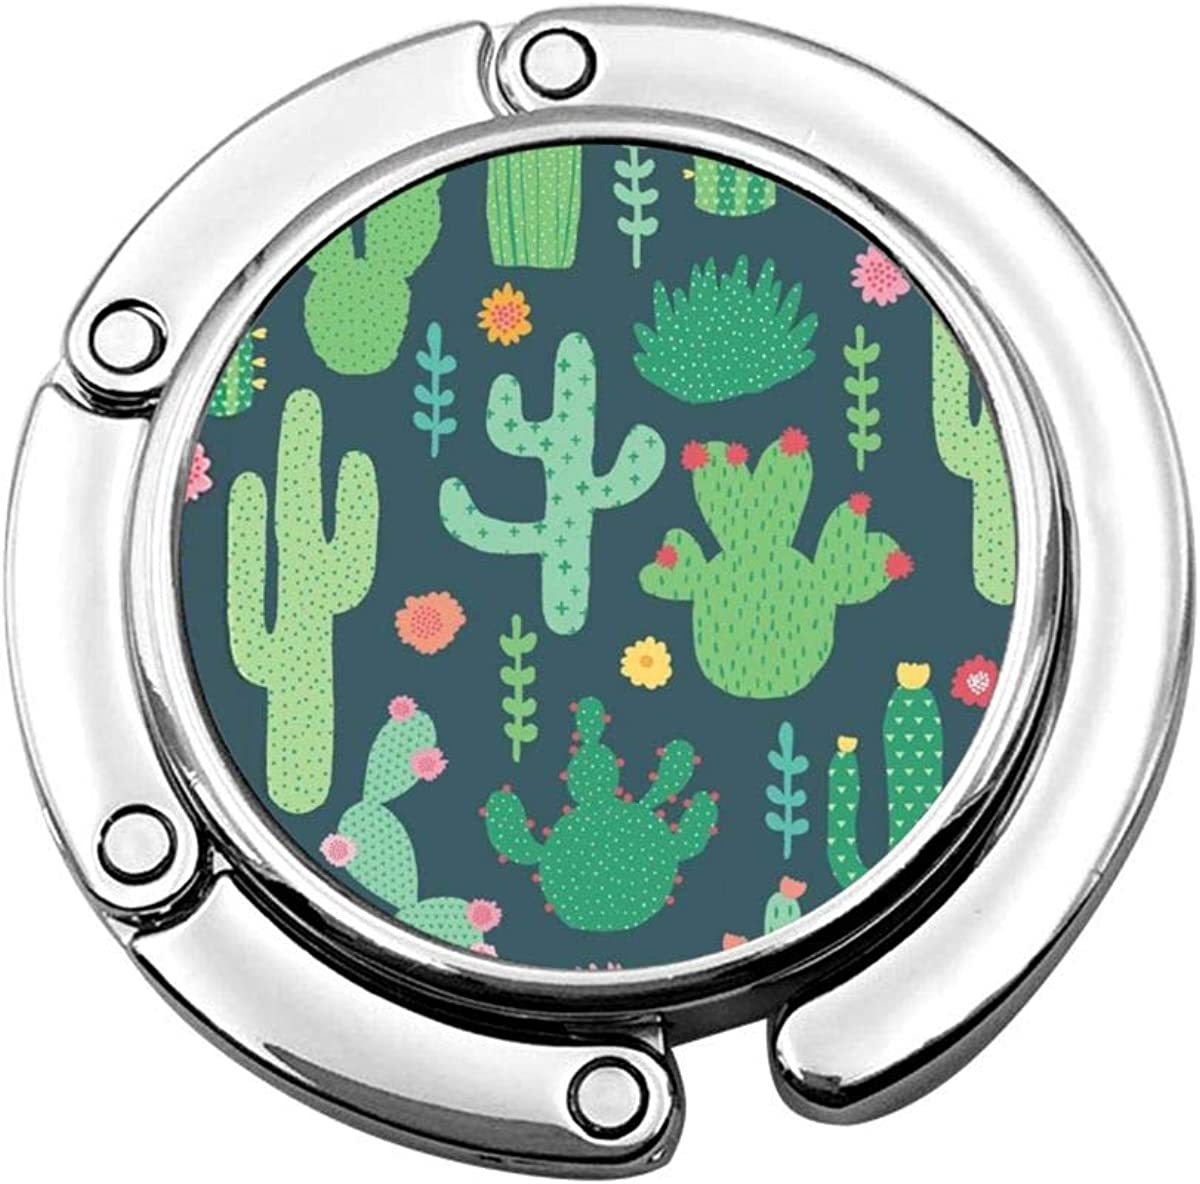 Purse Hook For Table Cactus And Flower Table Hooks For Purses Handbag Hanger For Men Cafe Desk Decor Foldable Holder Hook